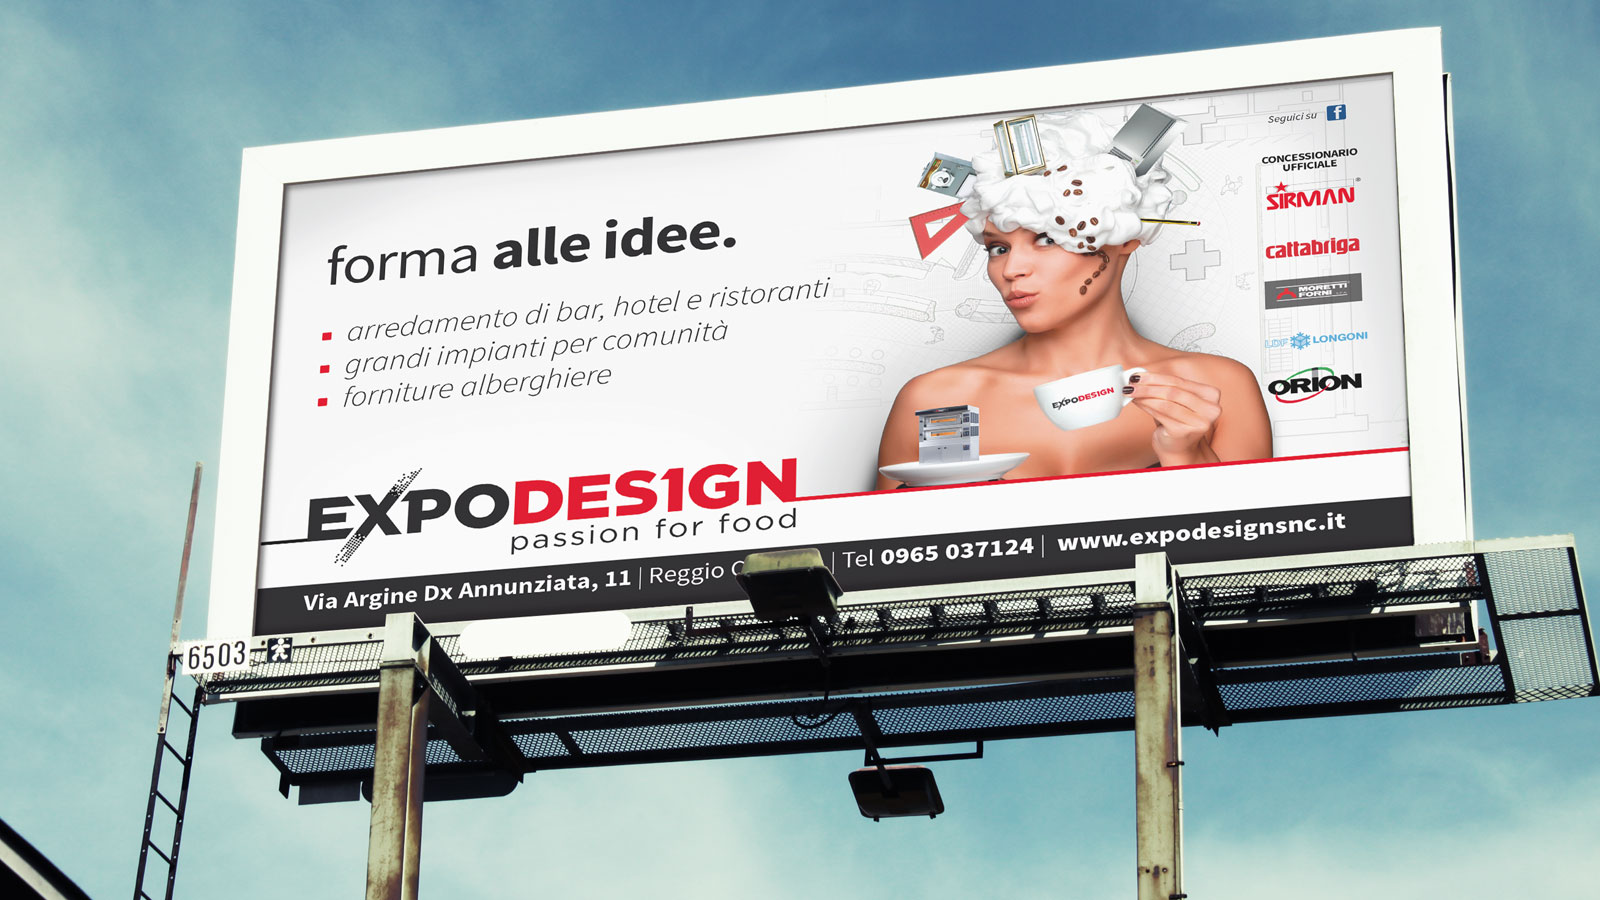 bisestyle-idee-expodesign-slider-8